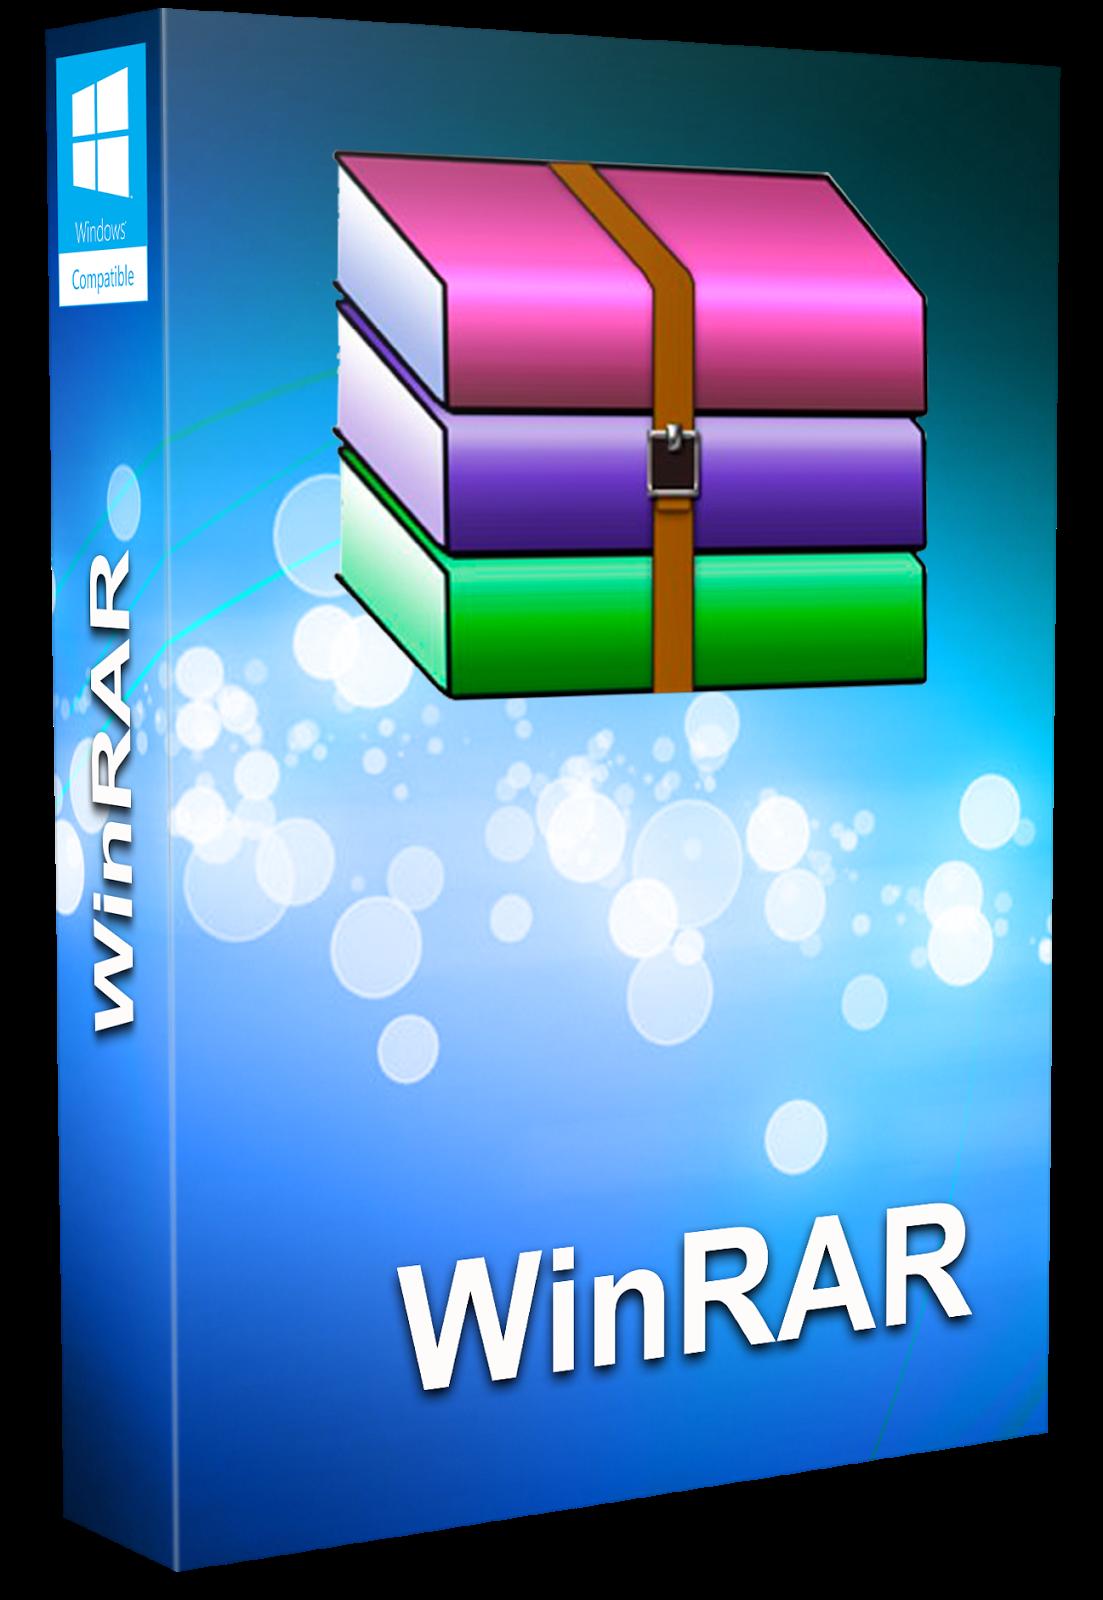 winrar software free download